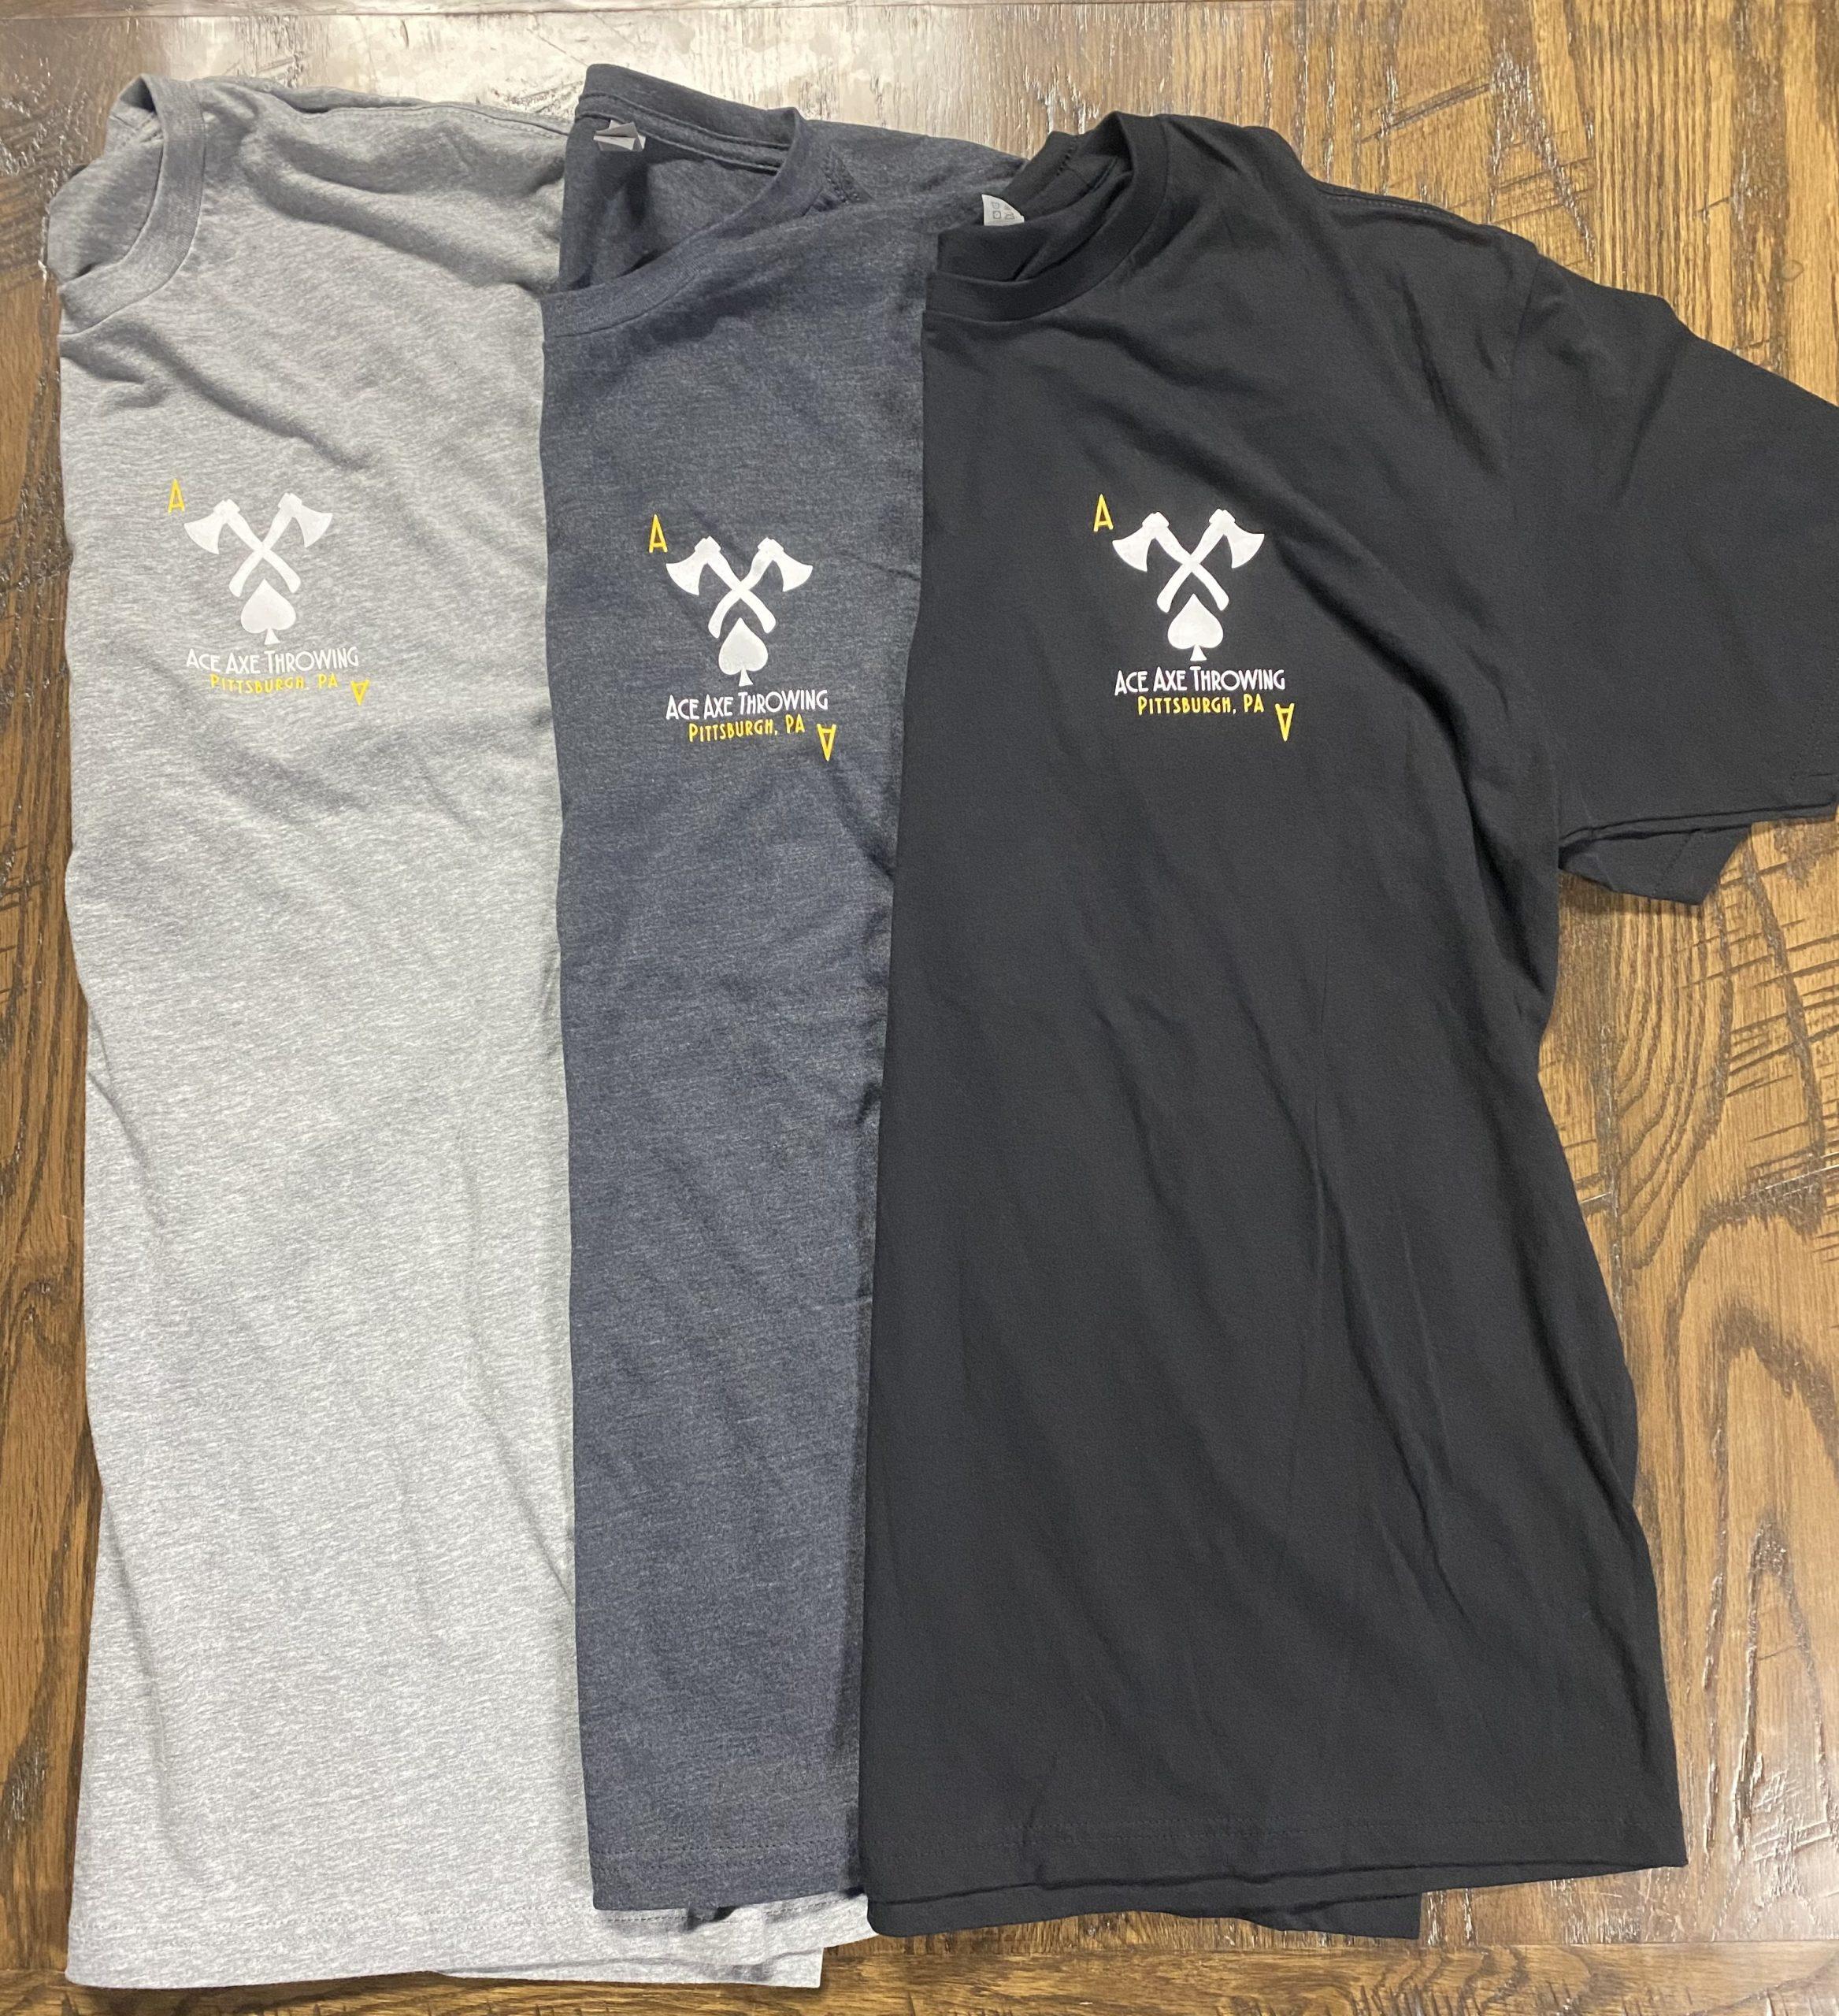 Ace Axe Throwing T-Shirt